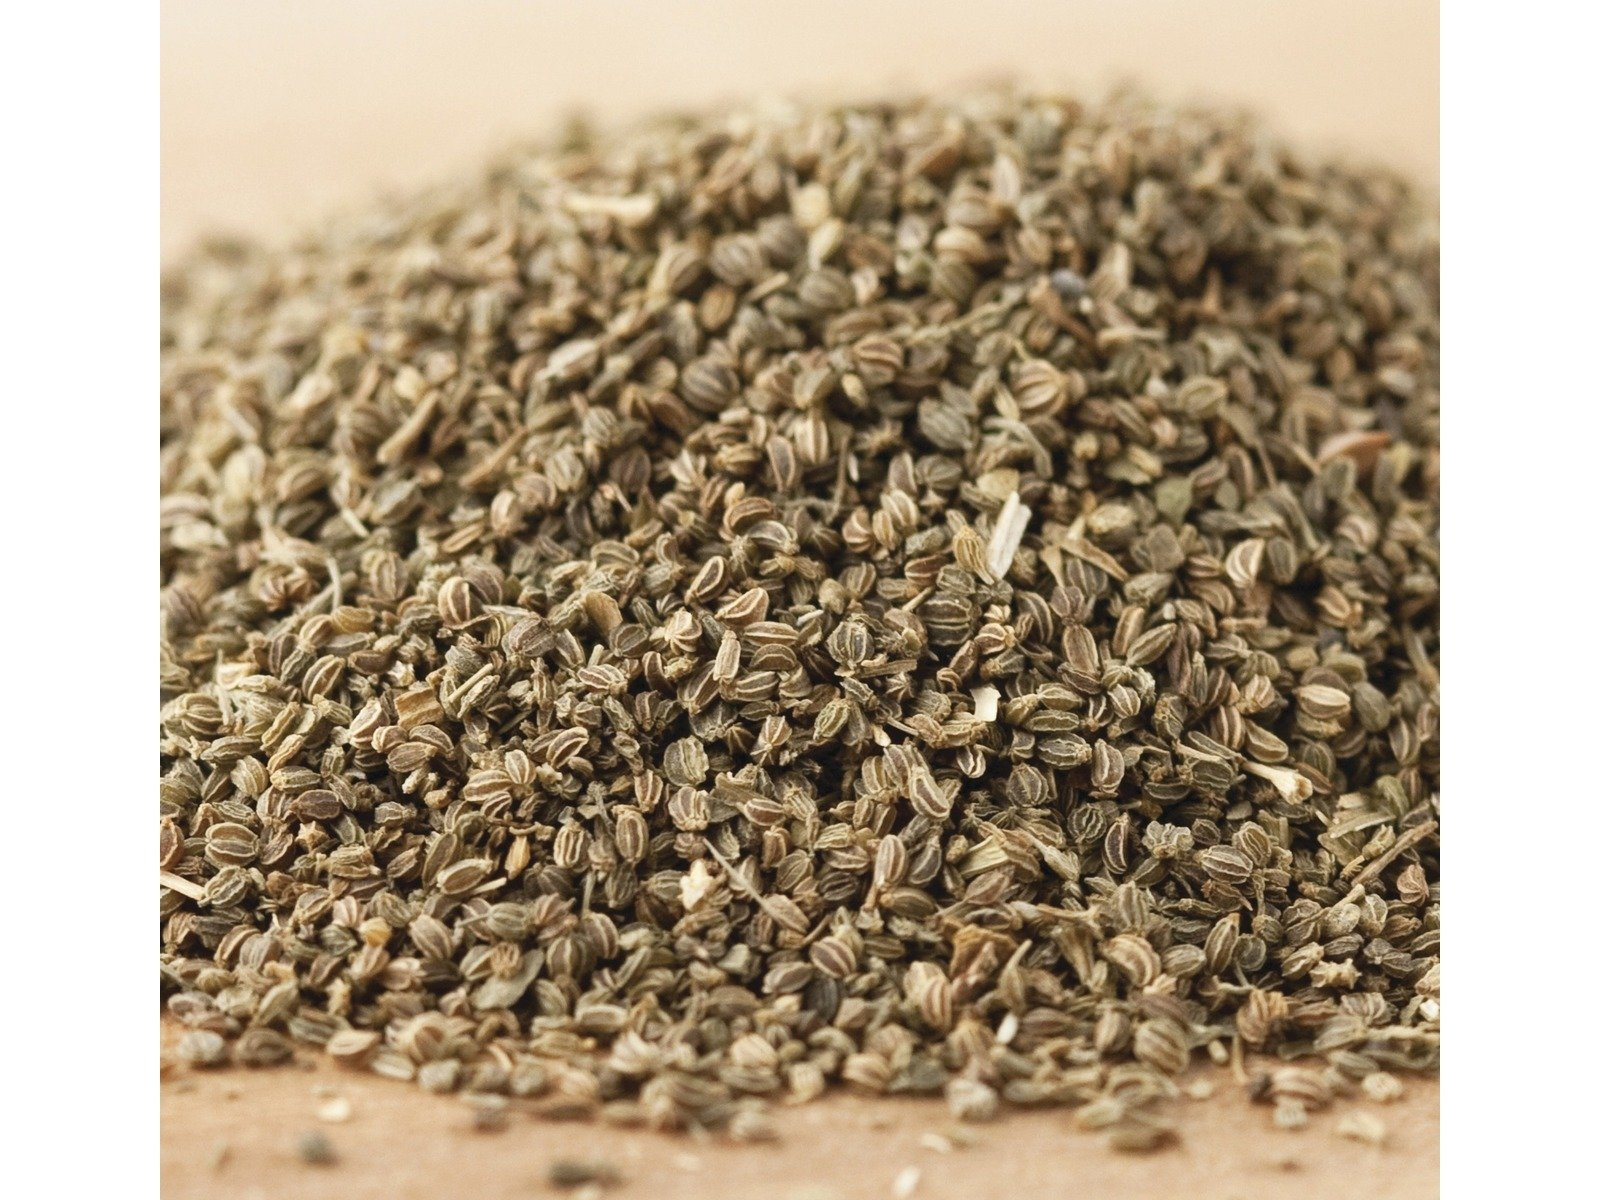 Celery Seeds Whole - Culinary Herb - One Pound